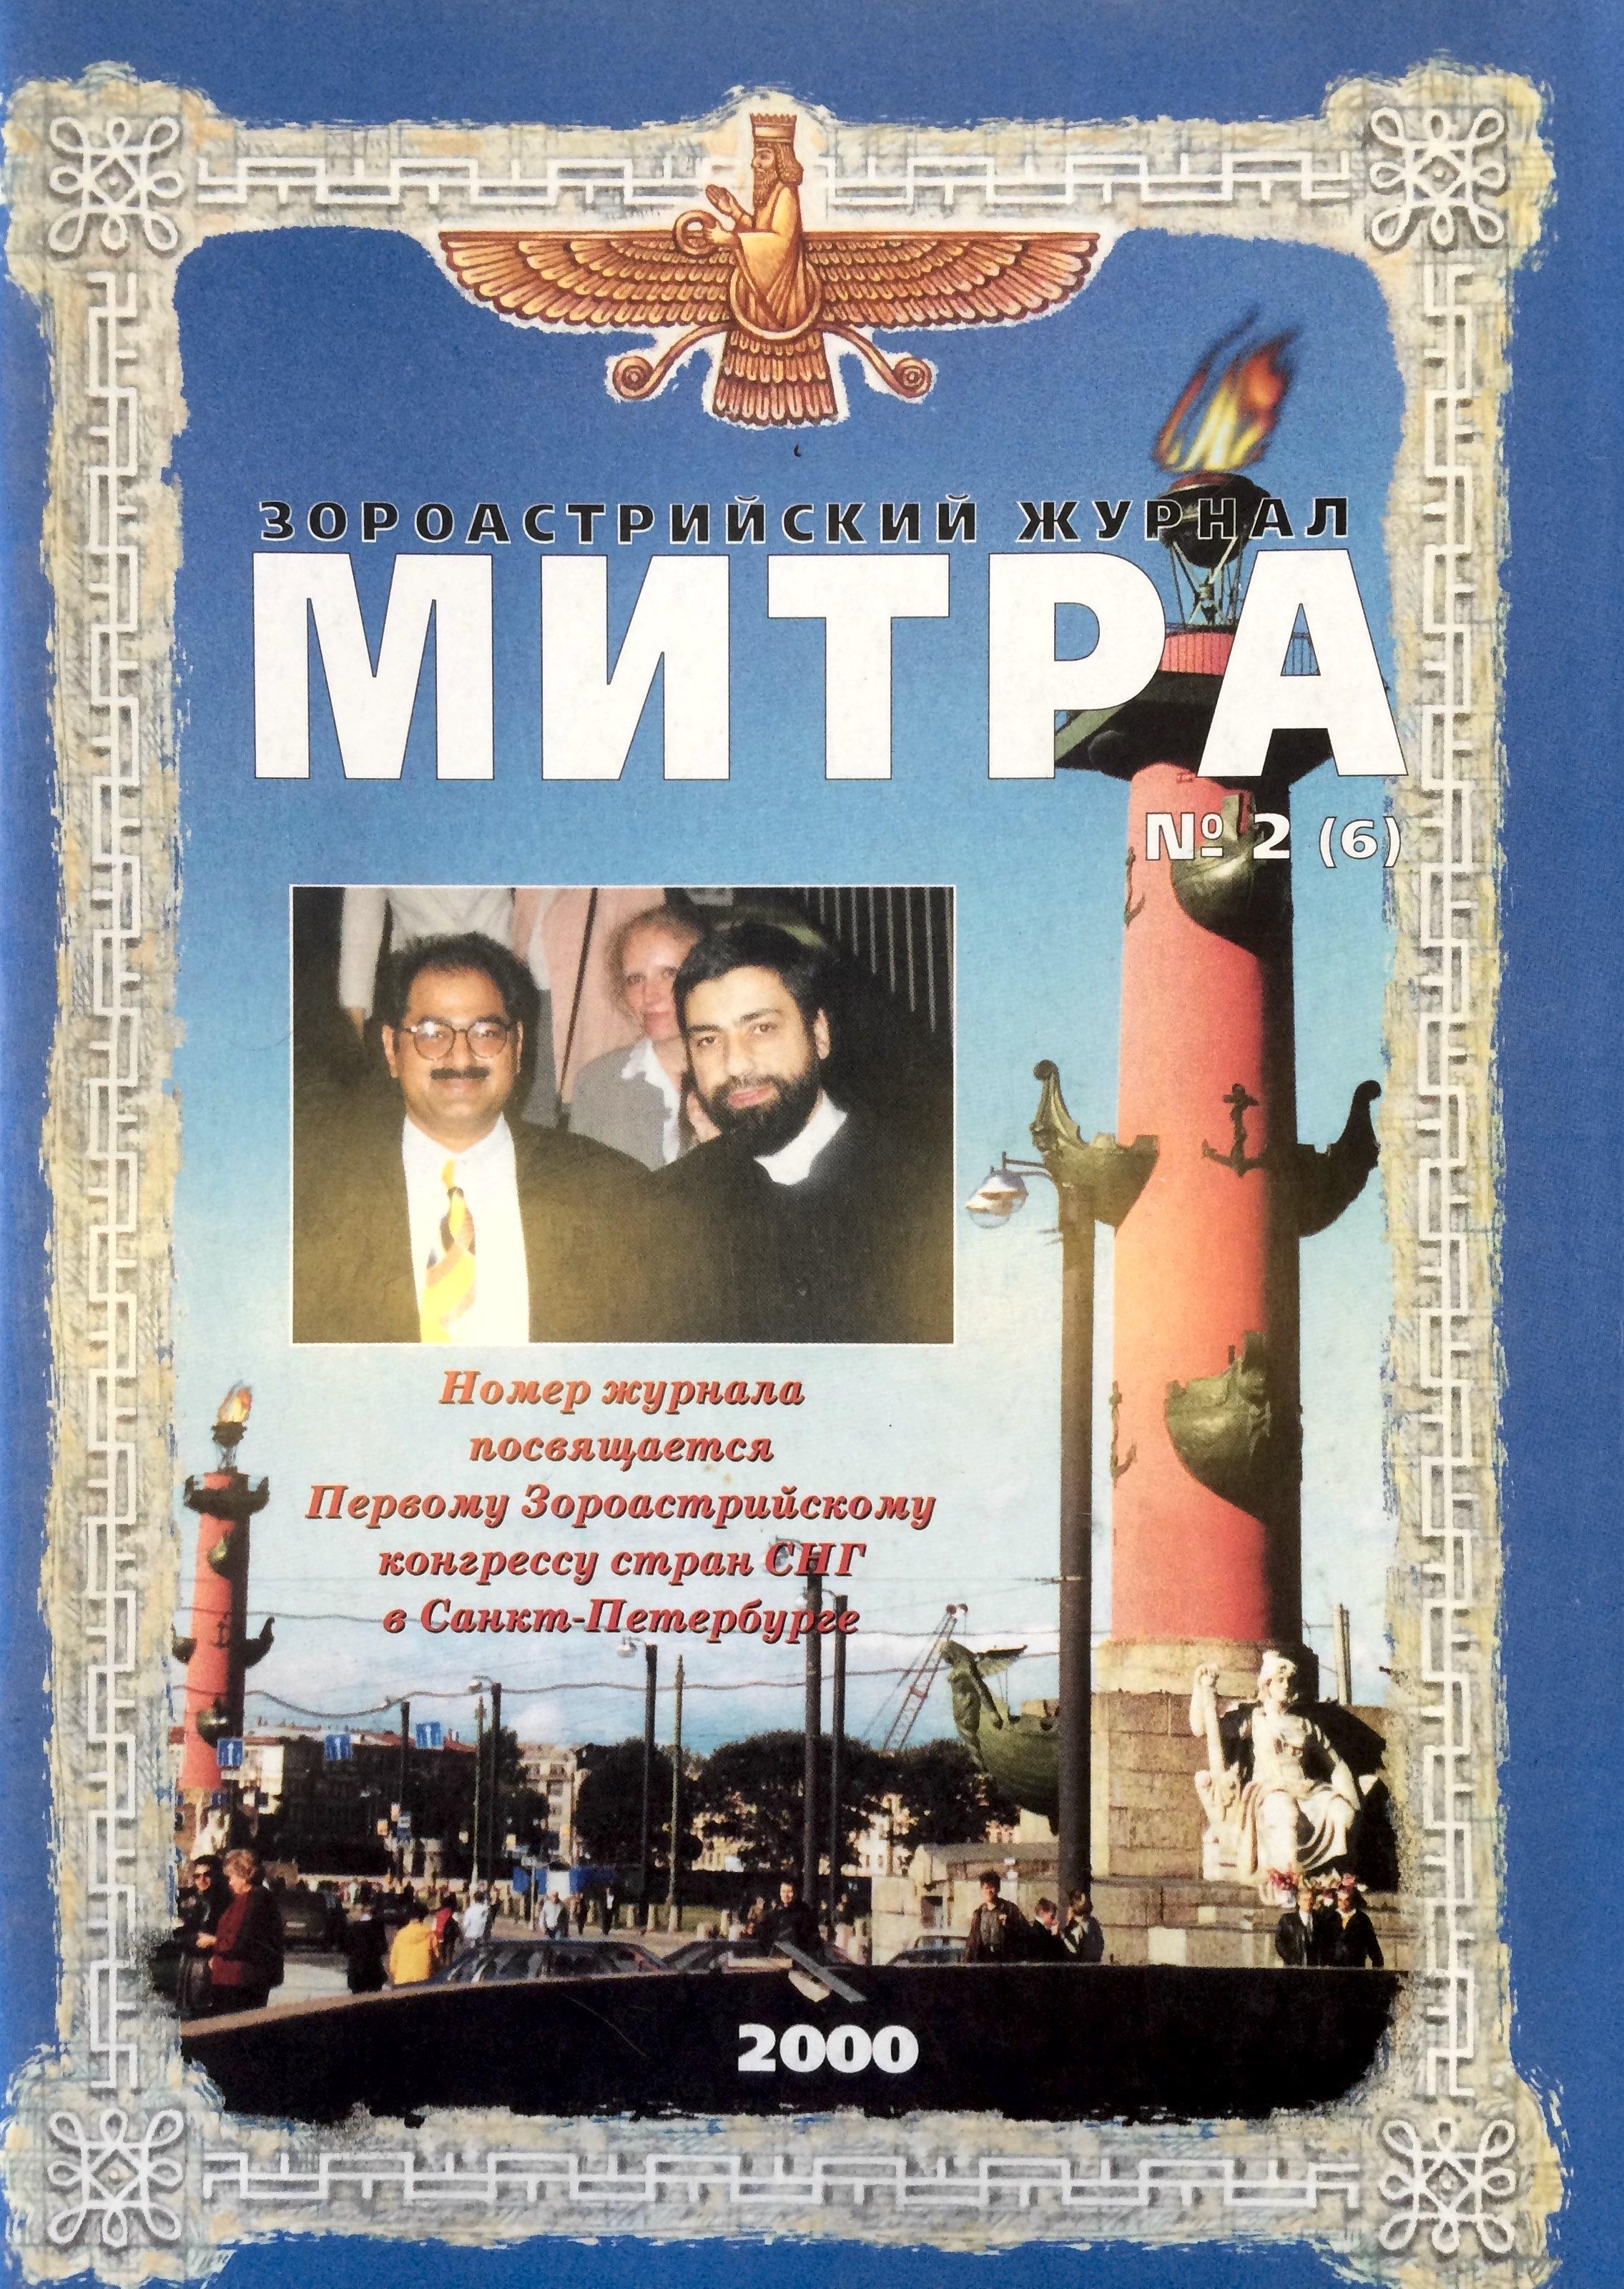 Mitra-02-06-2000